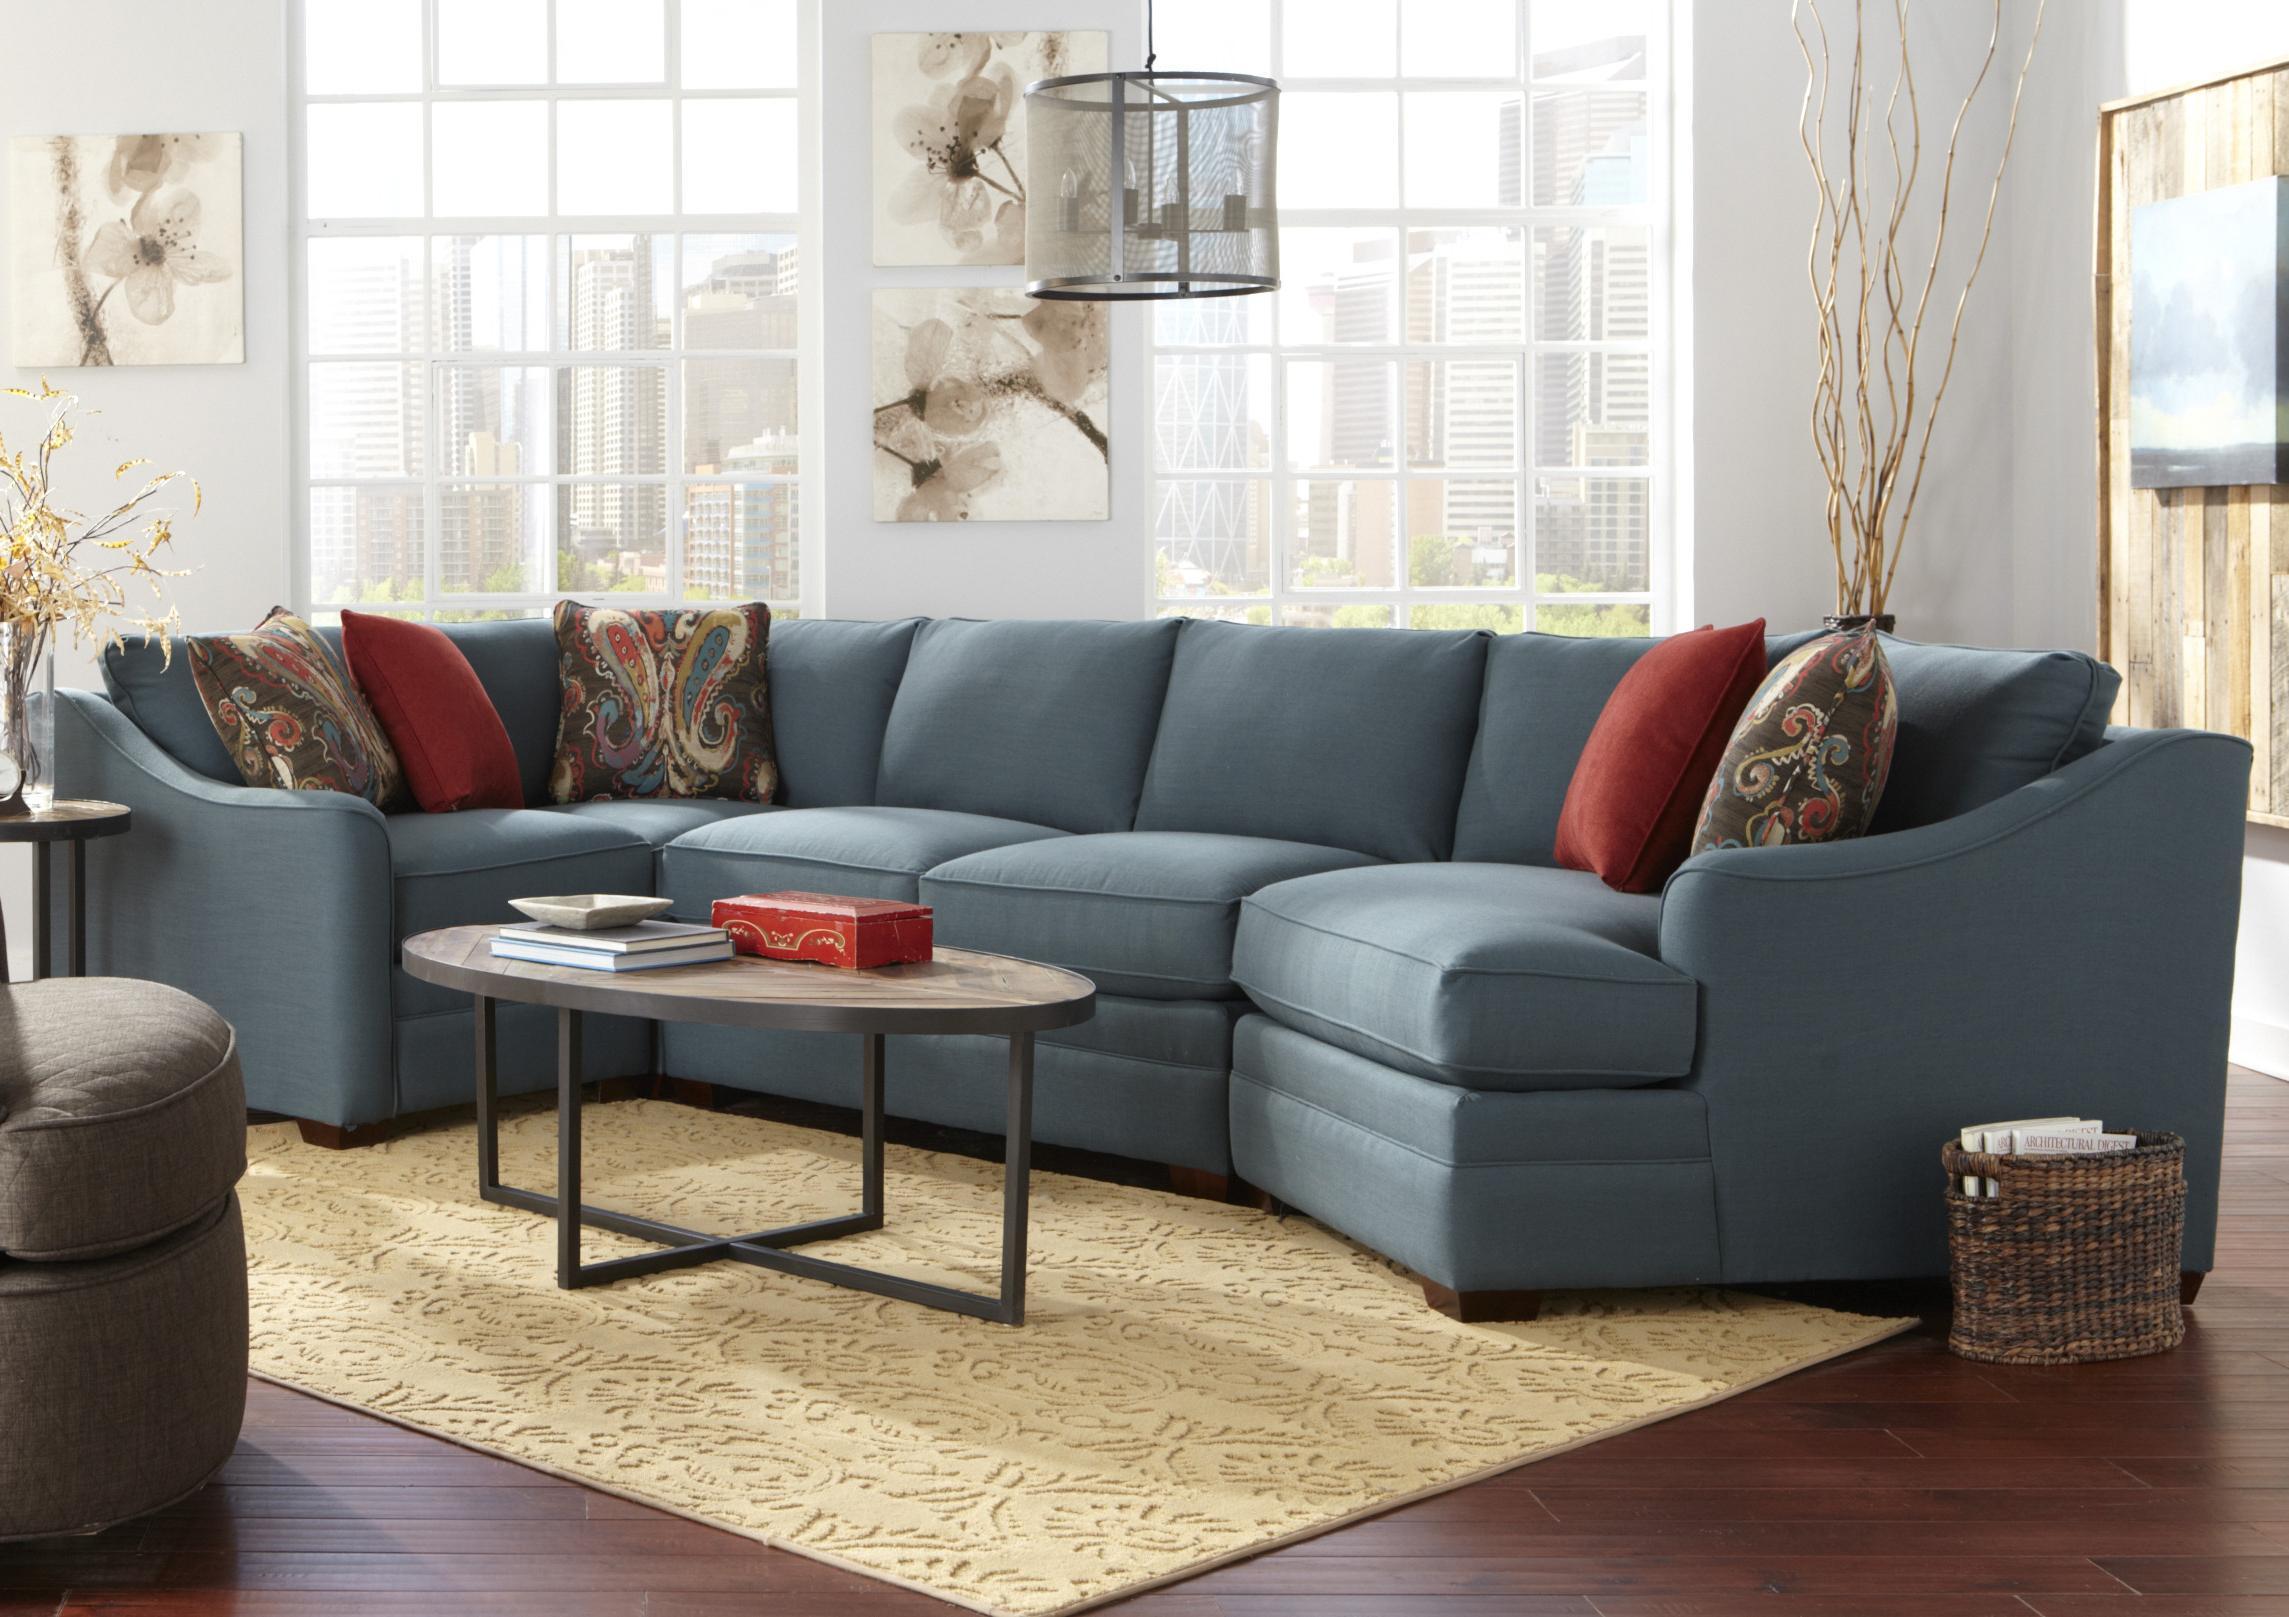 Craftmaster F9 Custom Collection Four Piece U003cbu003eCustomizableu003c/bu003e Sectional  Sofa